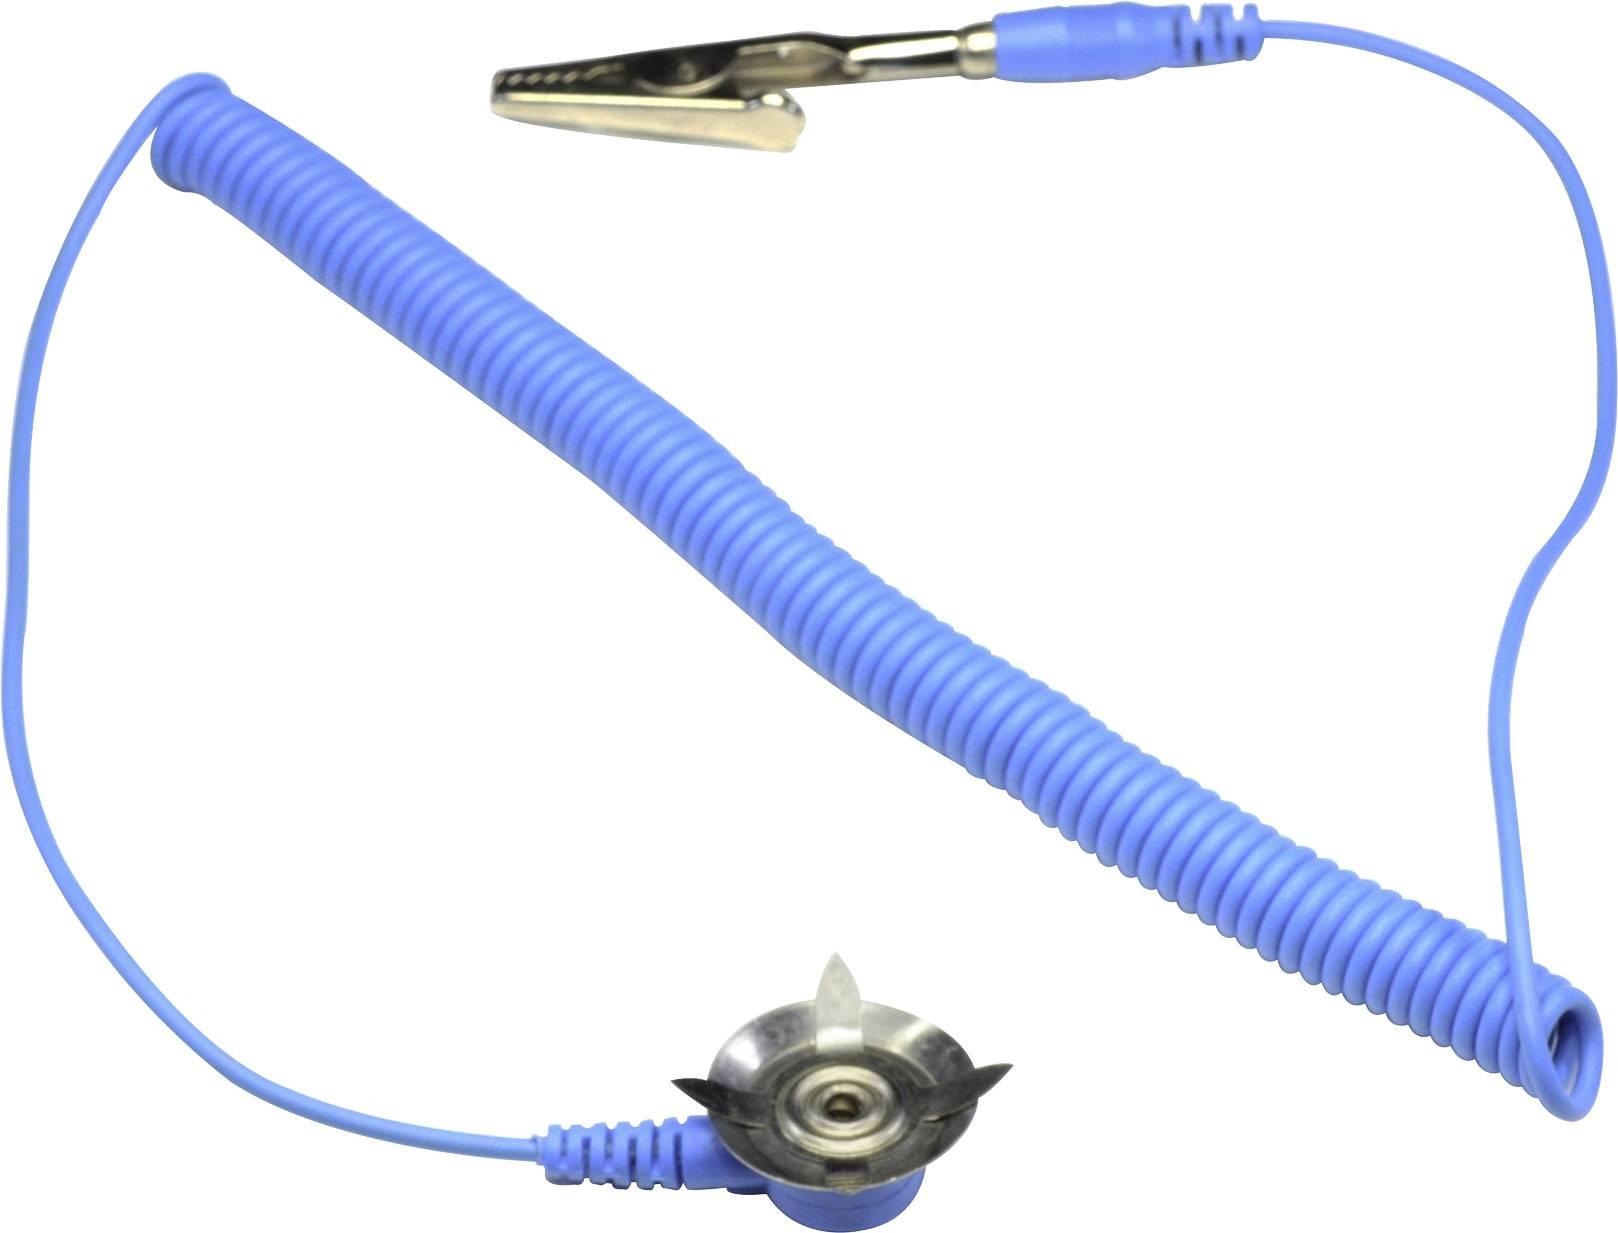 ESD zemnicí kabel k rohoži Conrad Components EkA-305-AD-S/K, 3.05 m krokosvorka